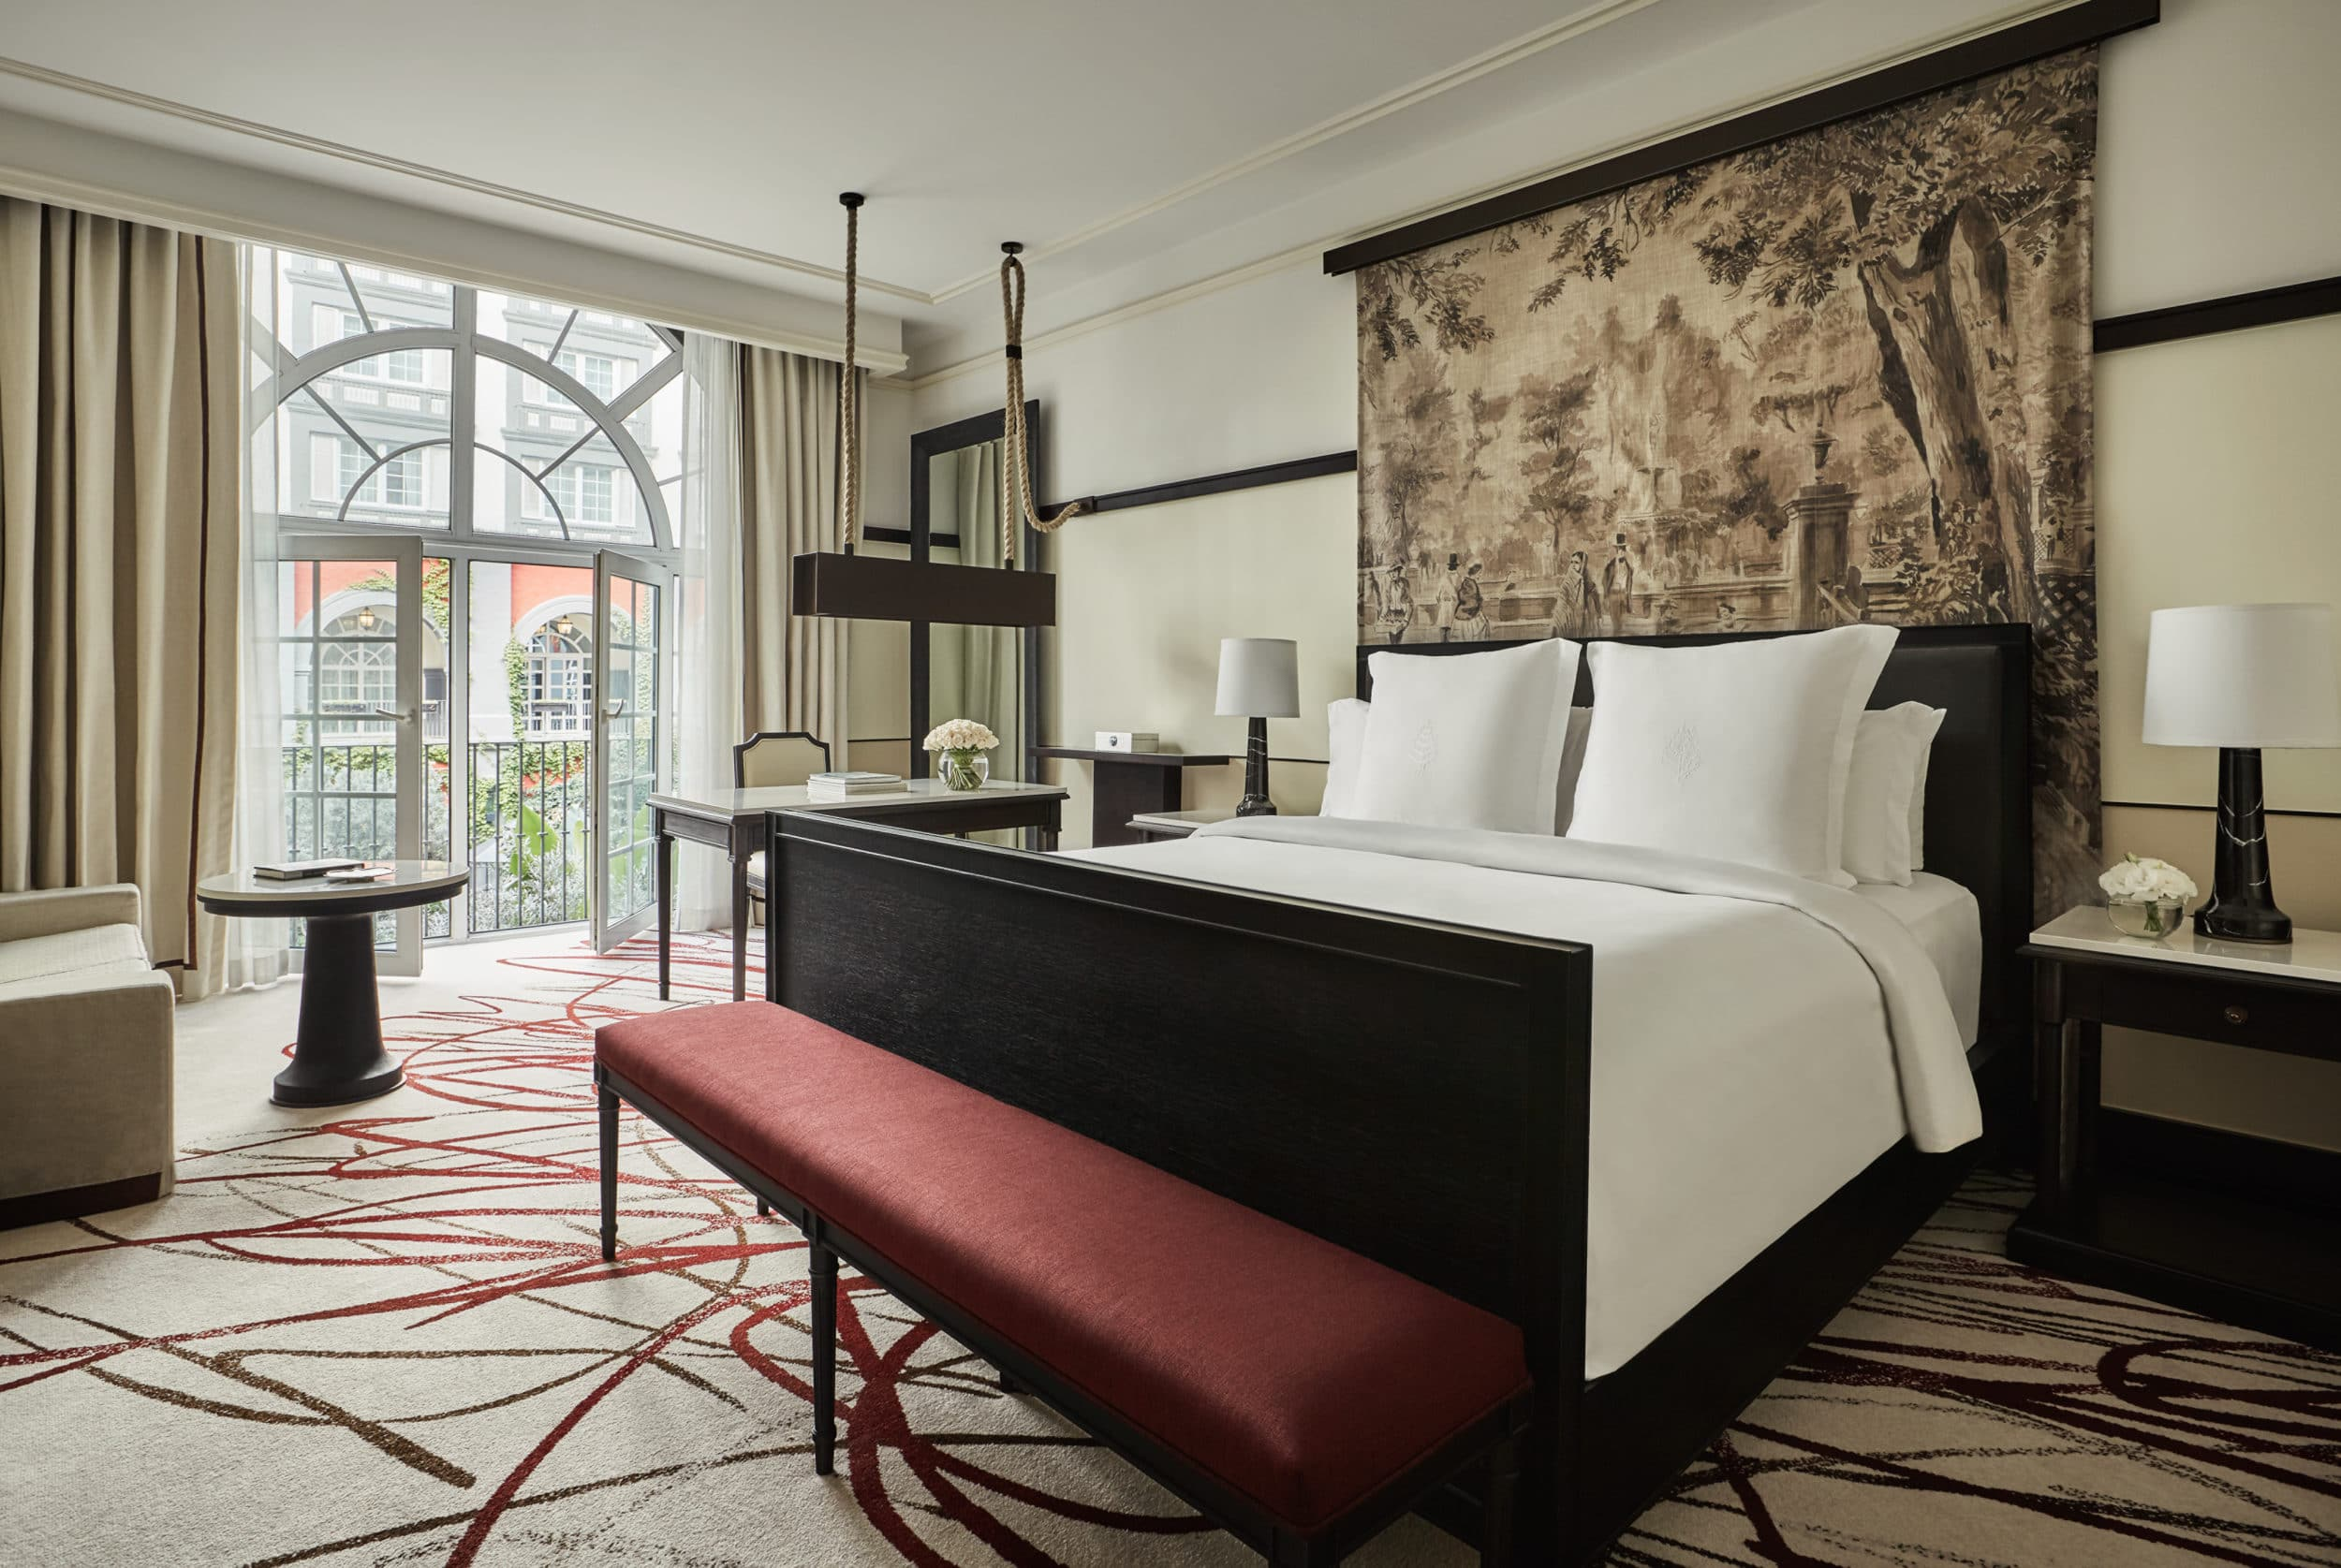 four seasons mexico city rooms